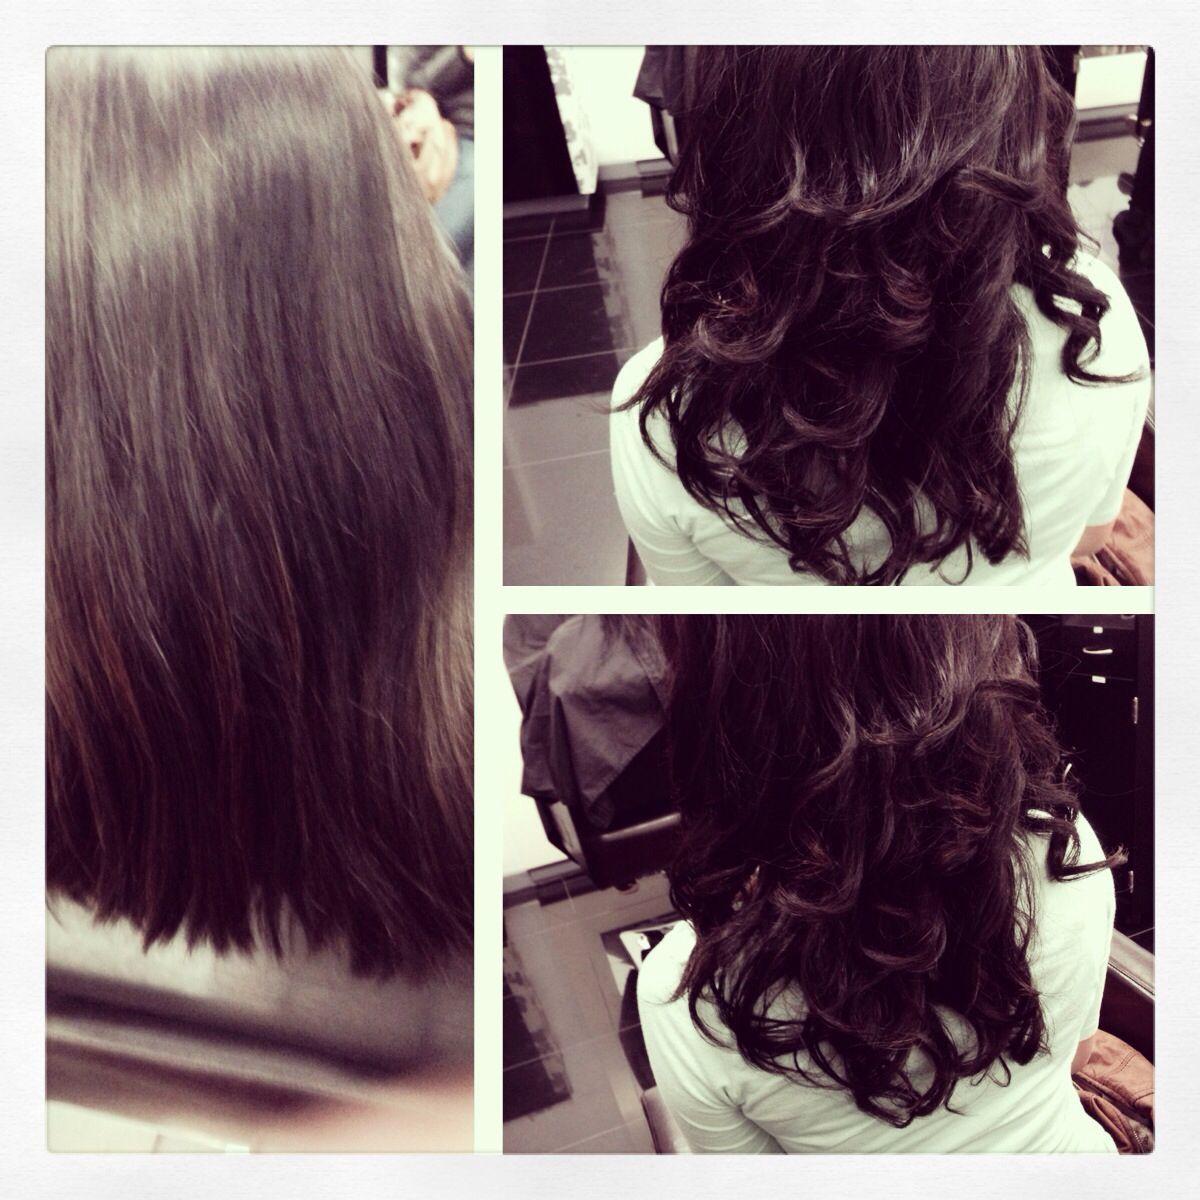 Digital Perm On Corse Thick Hair At Sune Salon San Francisco Www Mysune Com Thick Hair Styles Digital Perm Hair